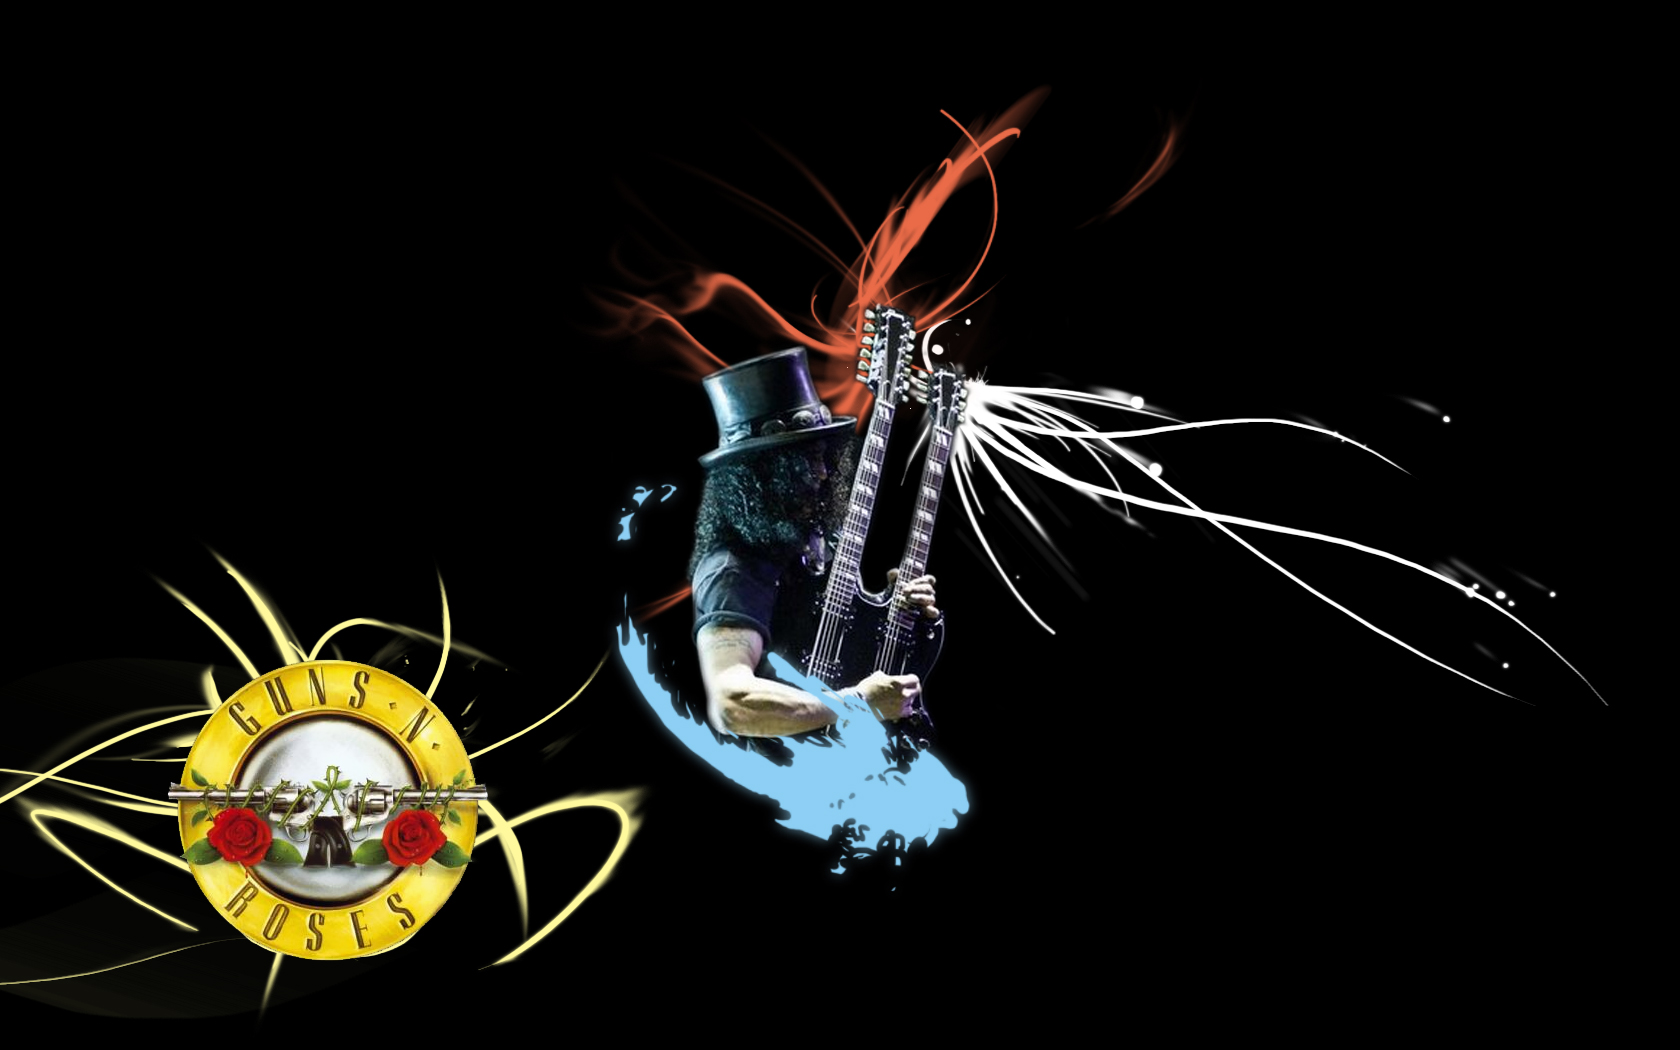 Free Download Guns N Roses Computer Wallpapers Desktop Backgrounds